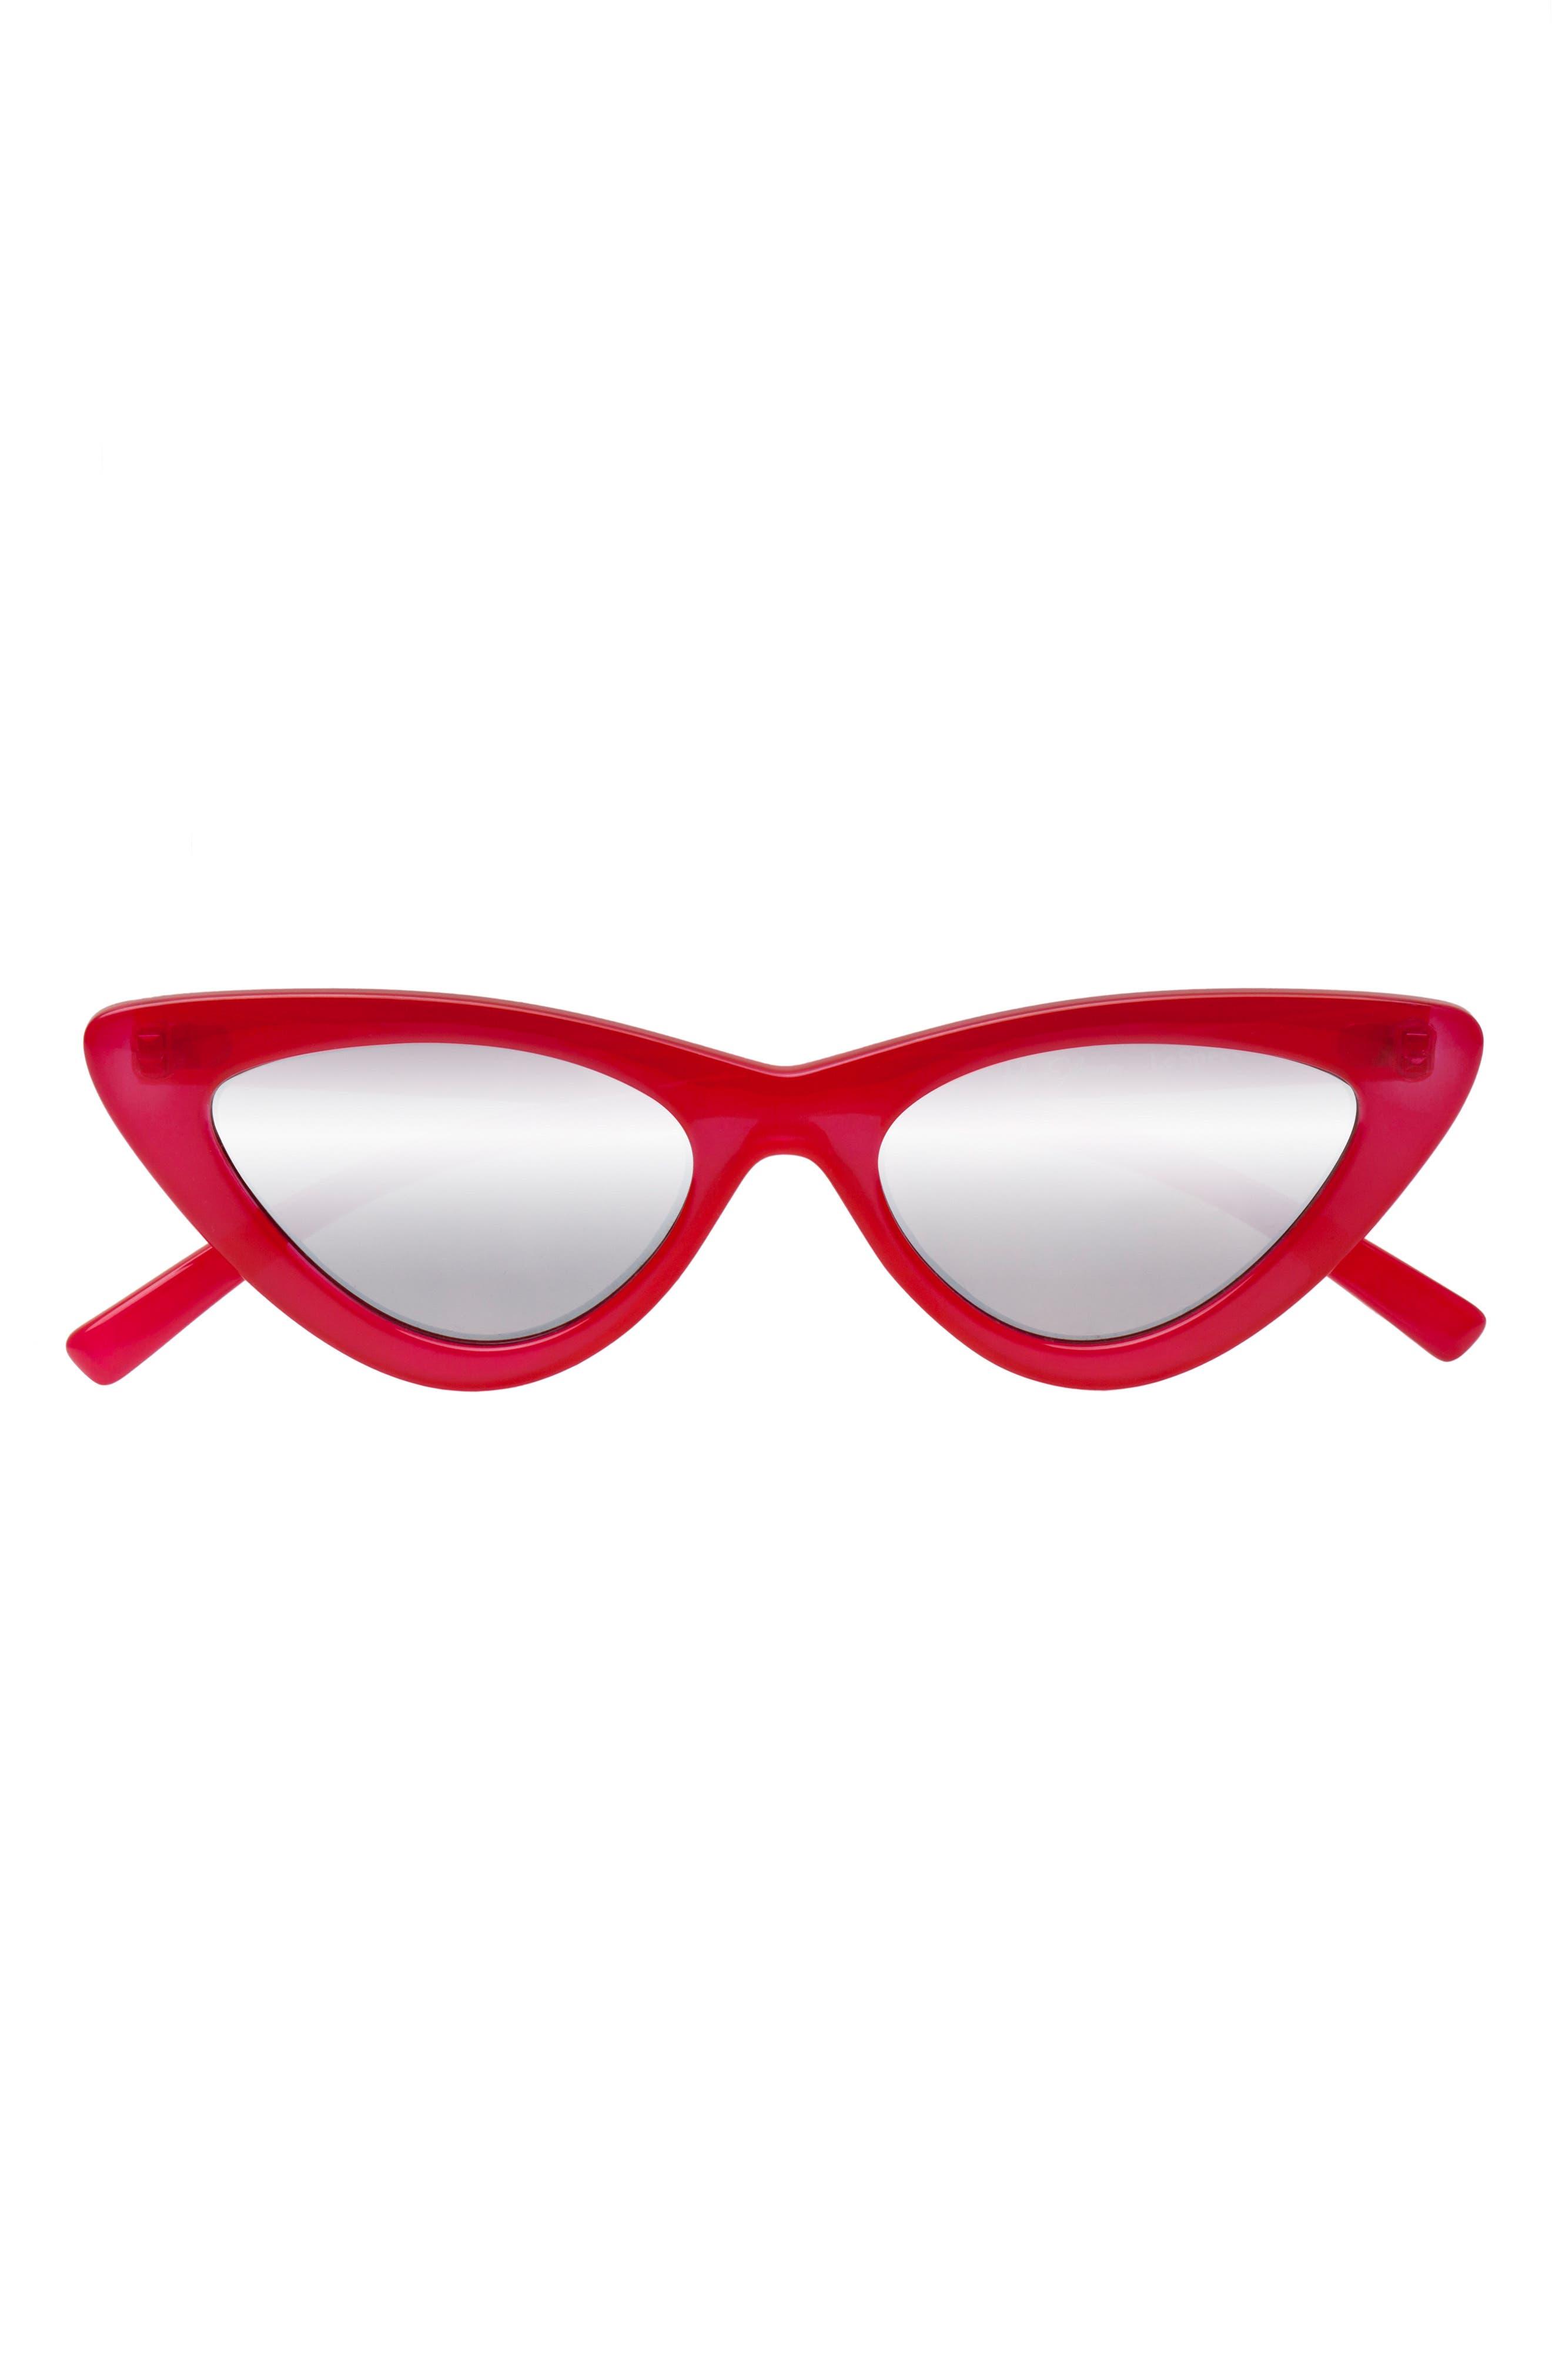 Adam Selman X Le Specs Luxe Lolita 4m Cat Eye Sunglasses - Opaque Red